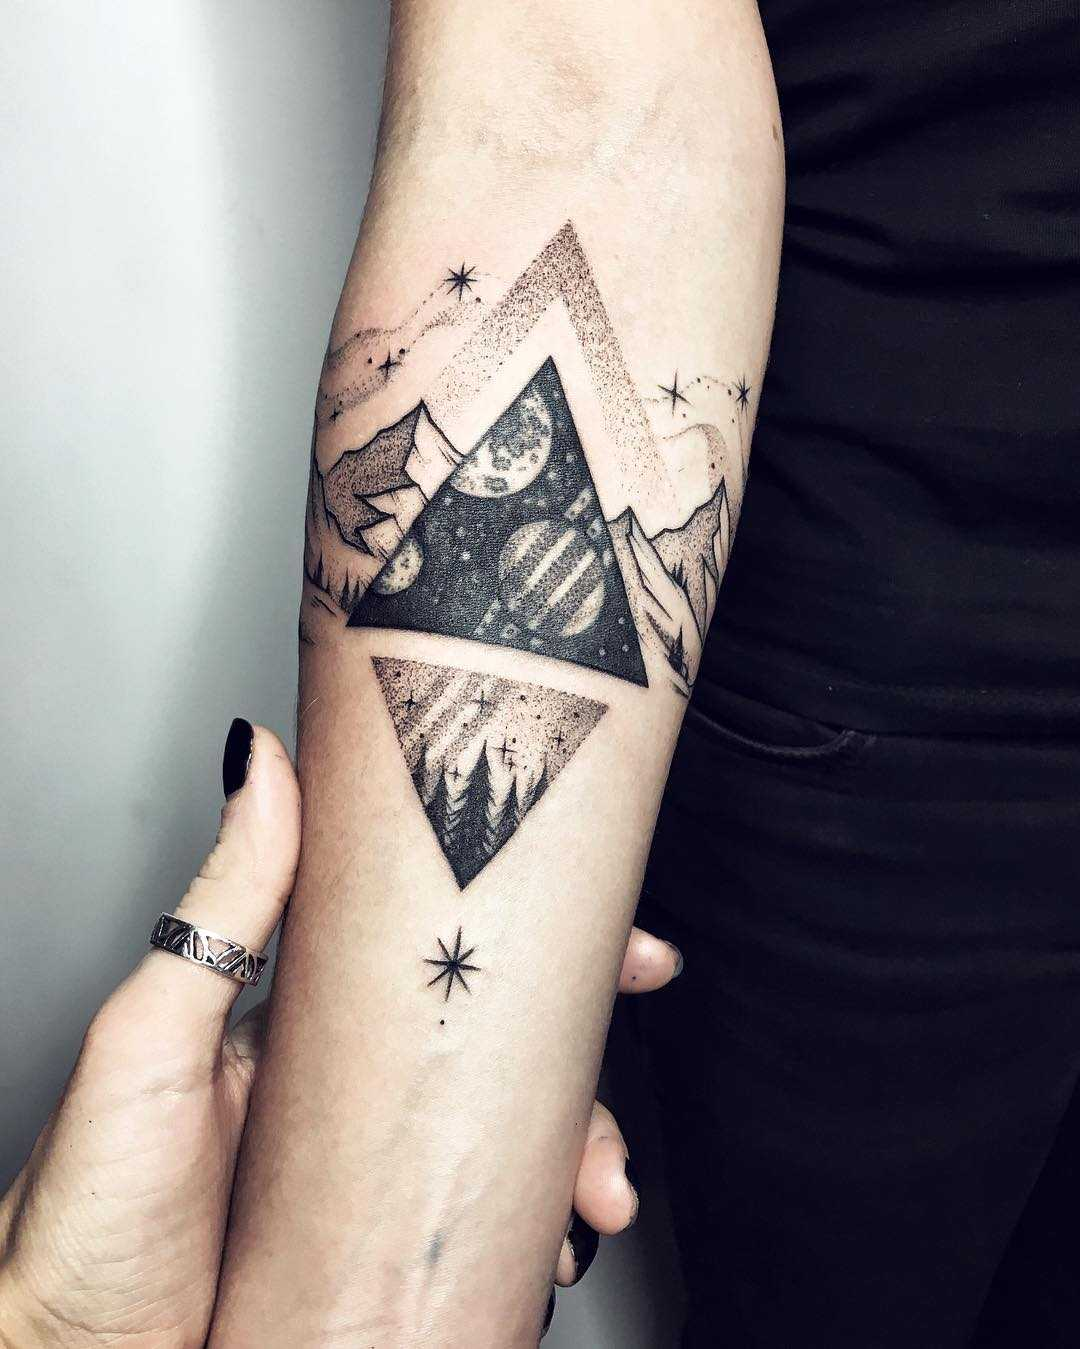 Cosmic Triangle Tattoo By Sasha Tattooing Tattoogrid Net